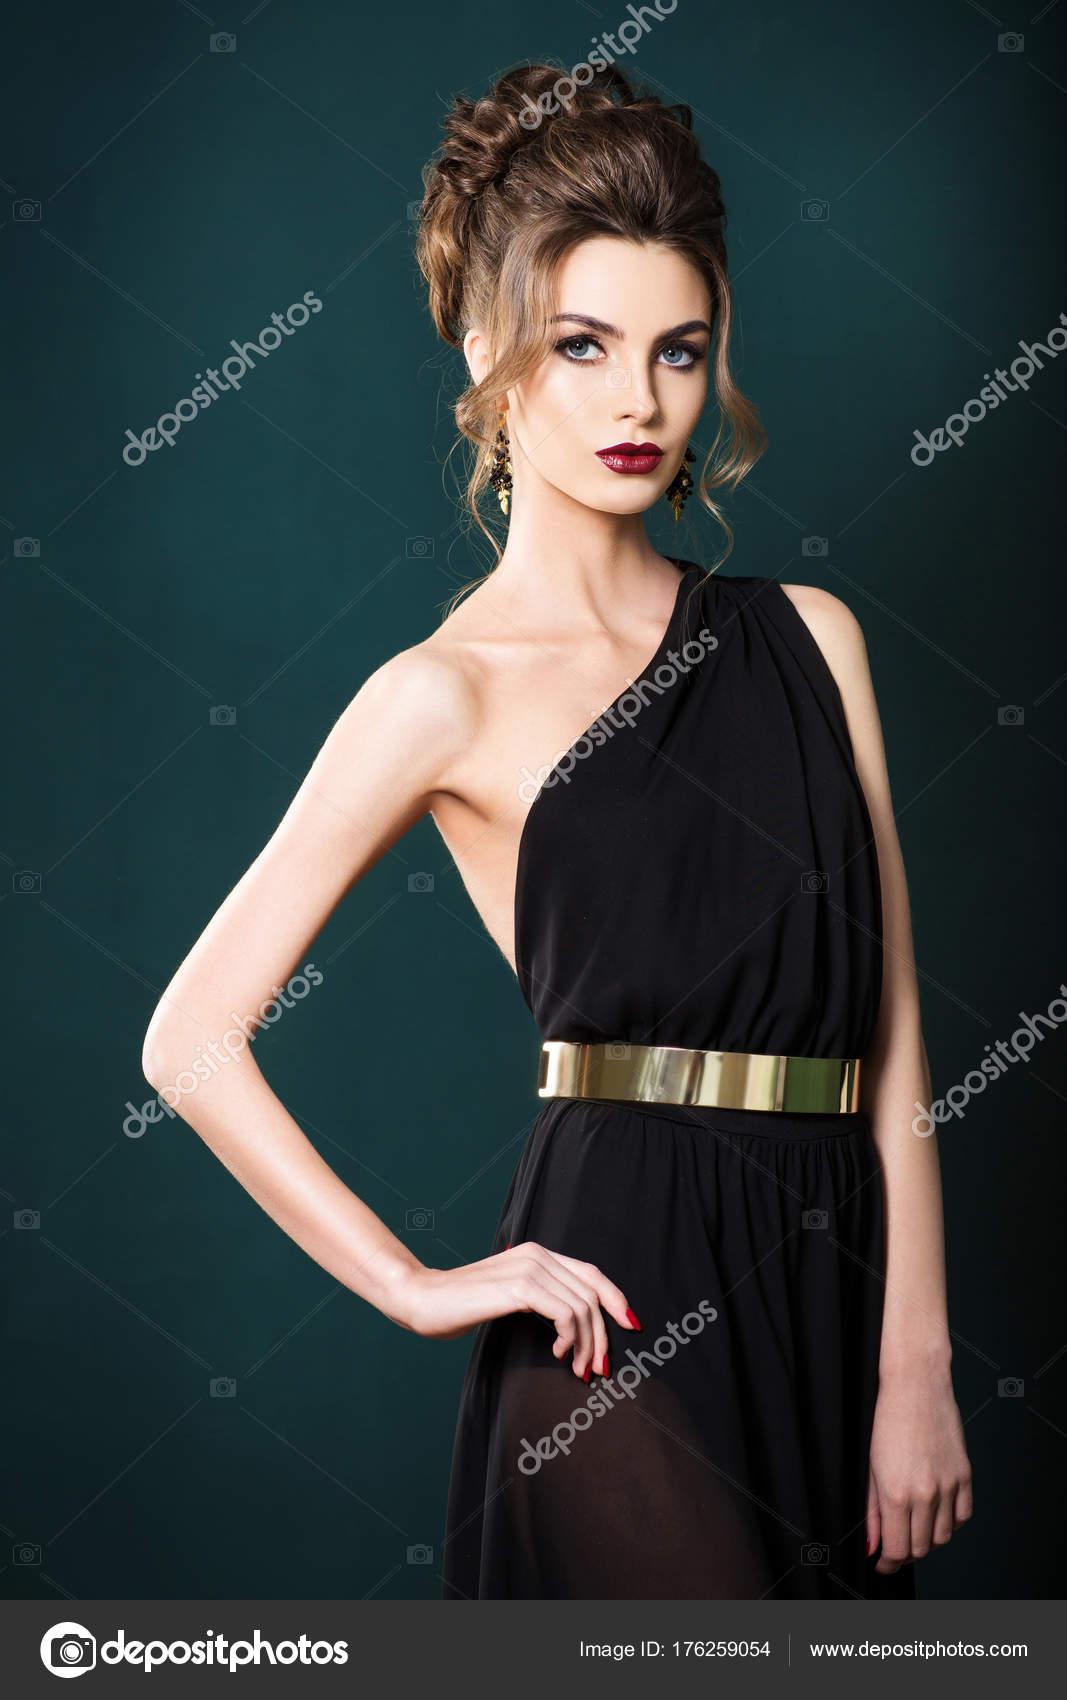 Fondo para vestido negro